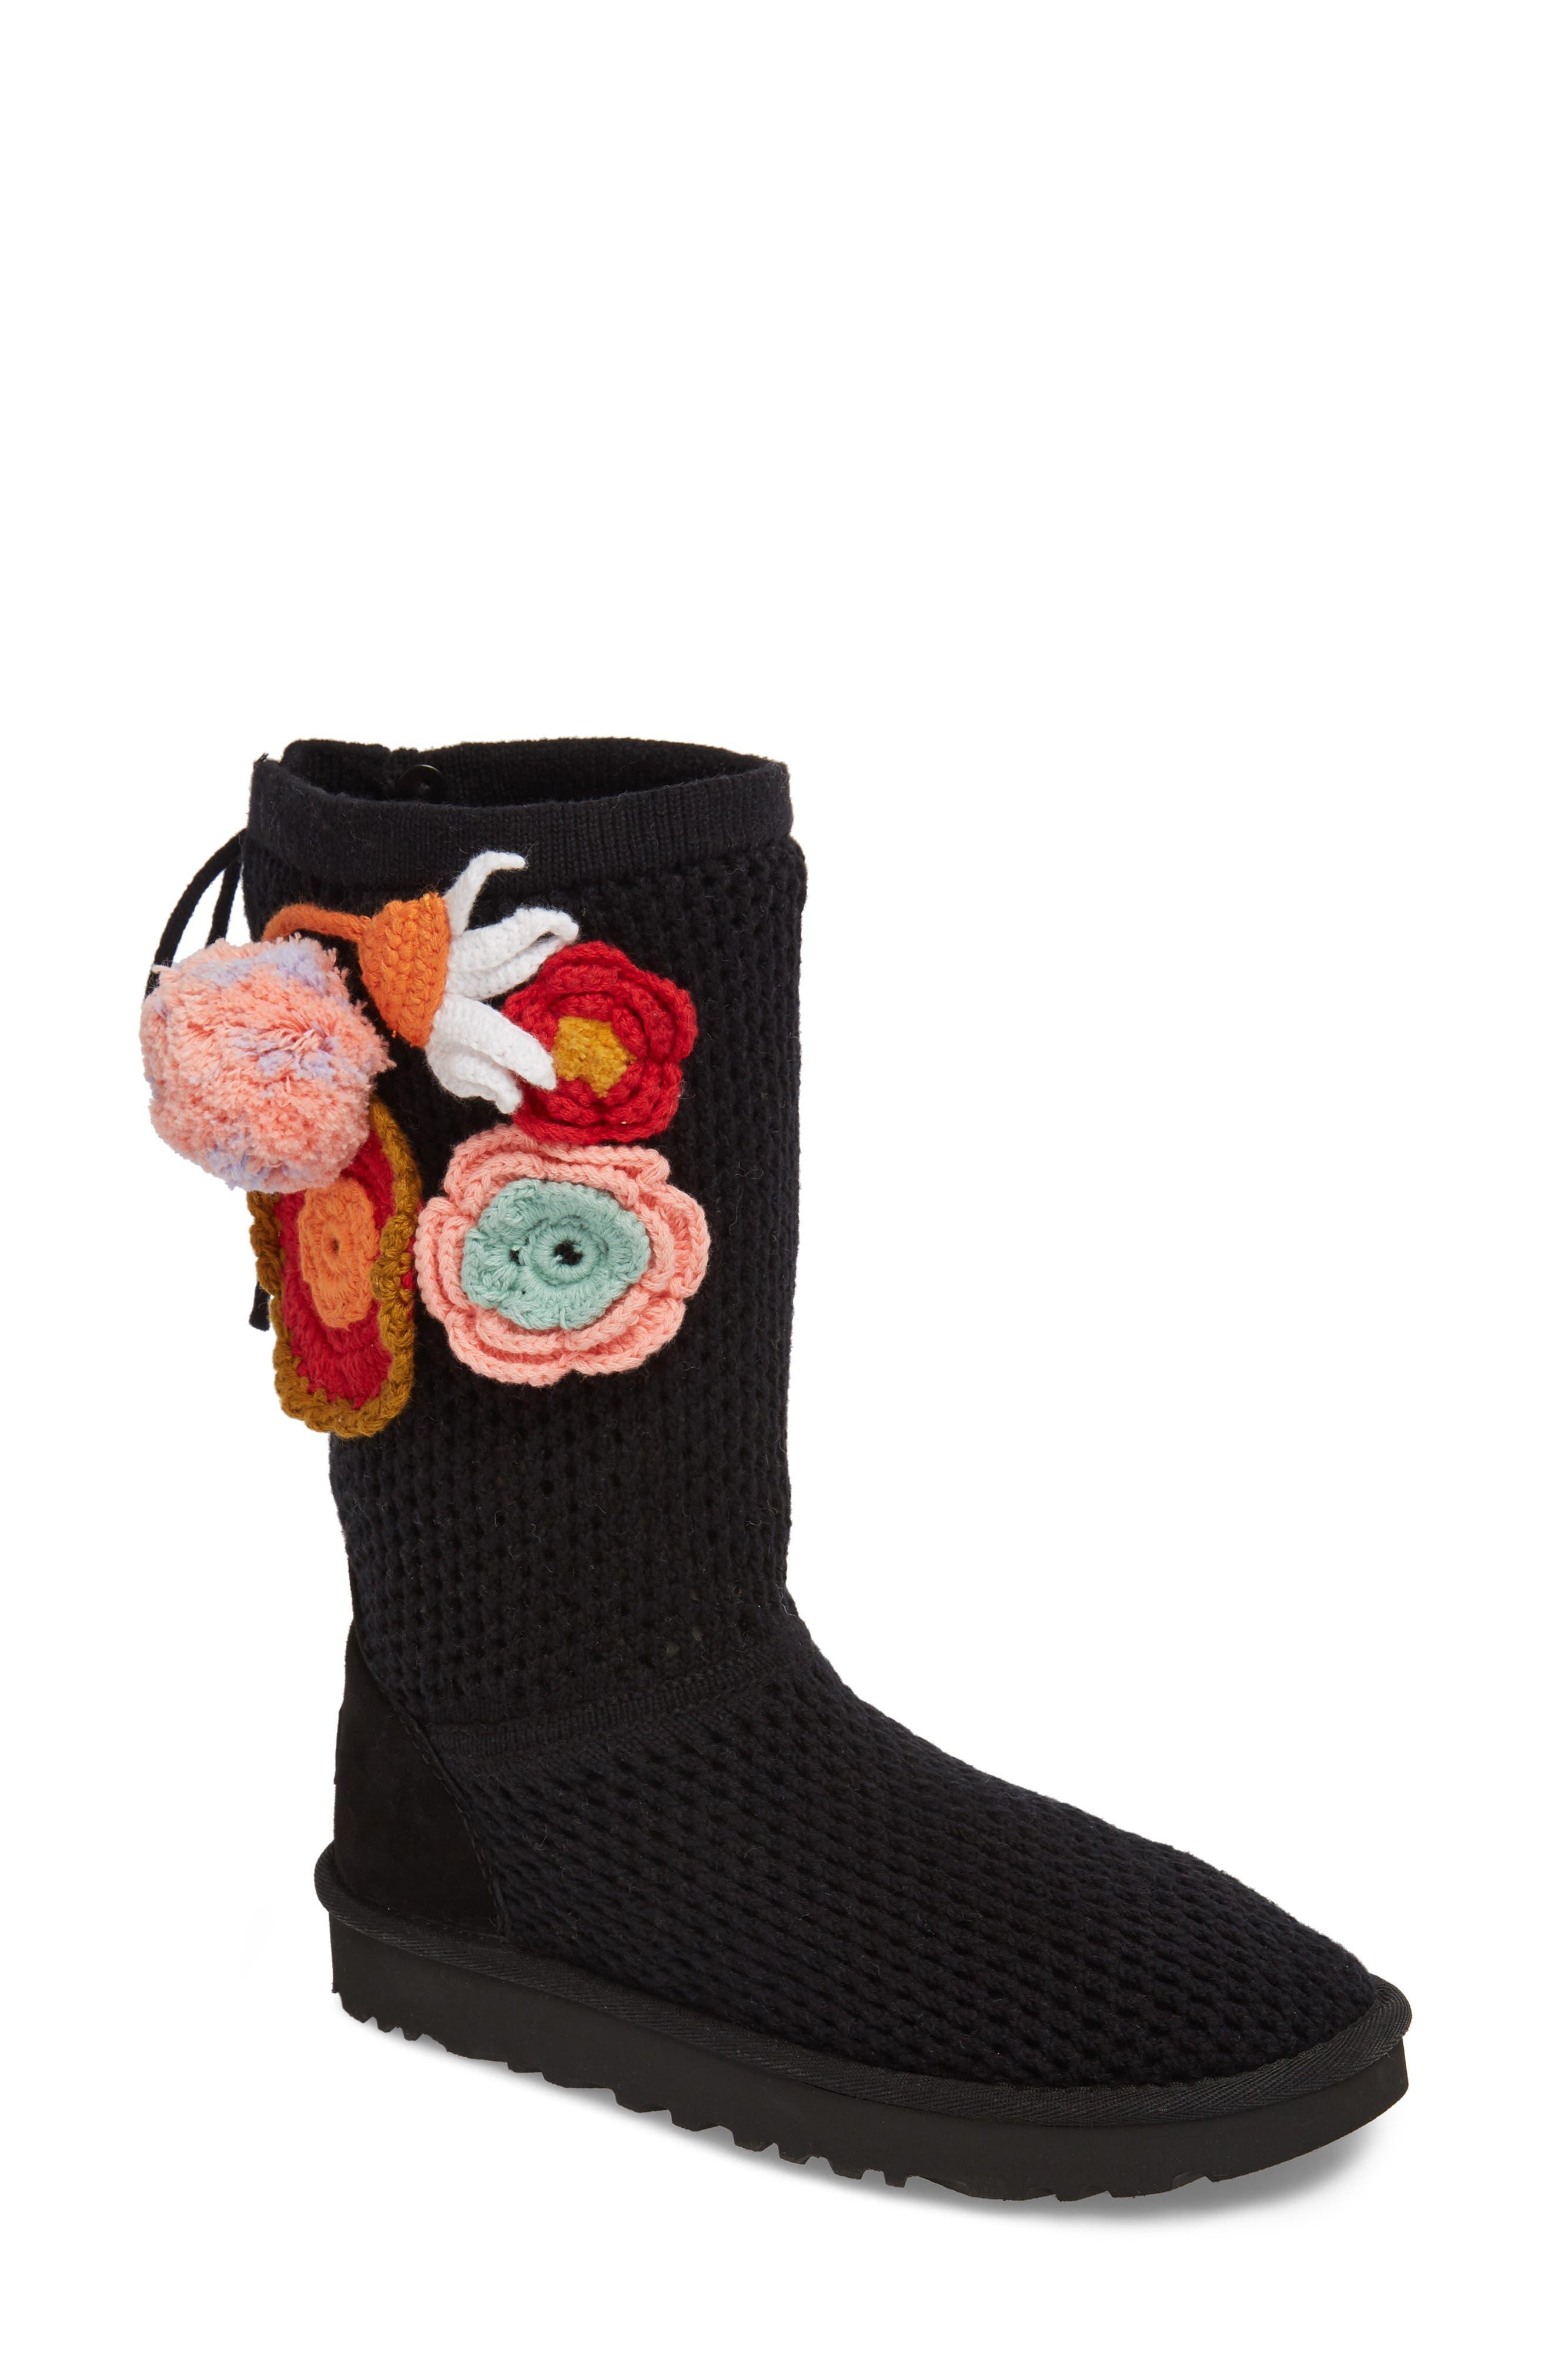 Crochet Classic Tall Boot,                             Main thumbnail 1, color,